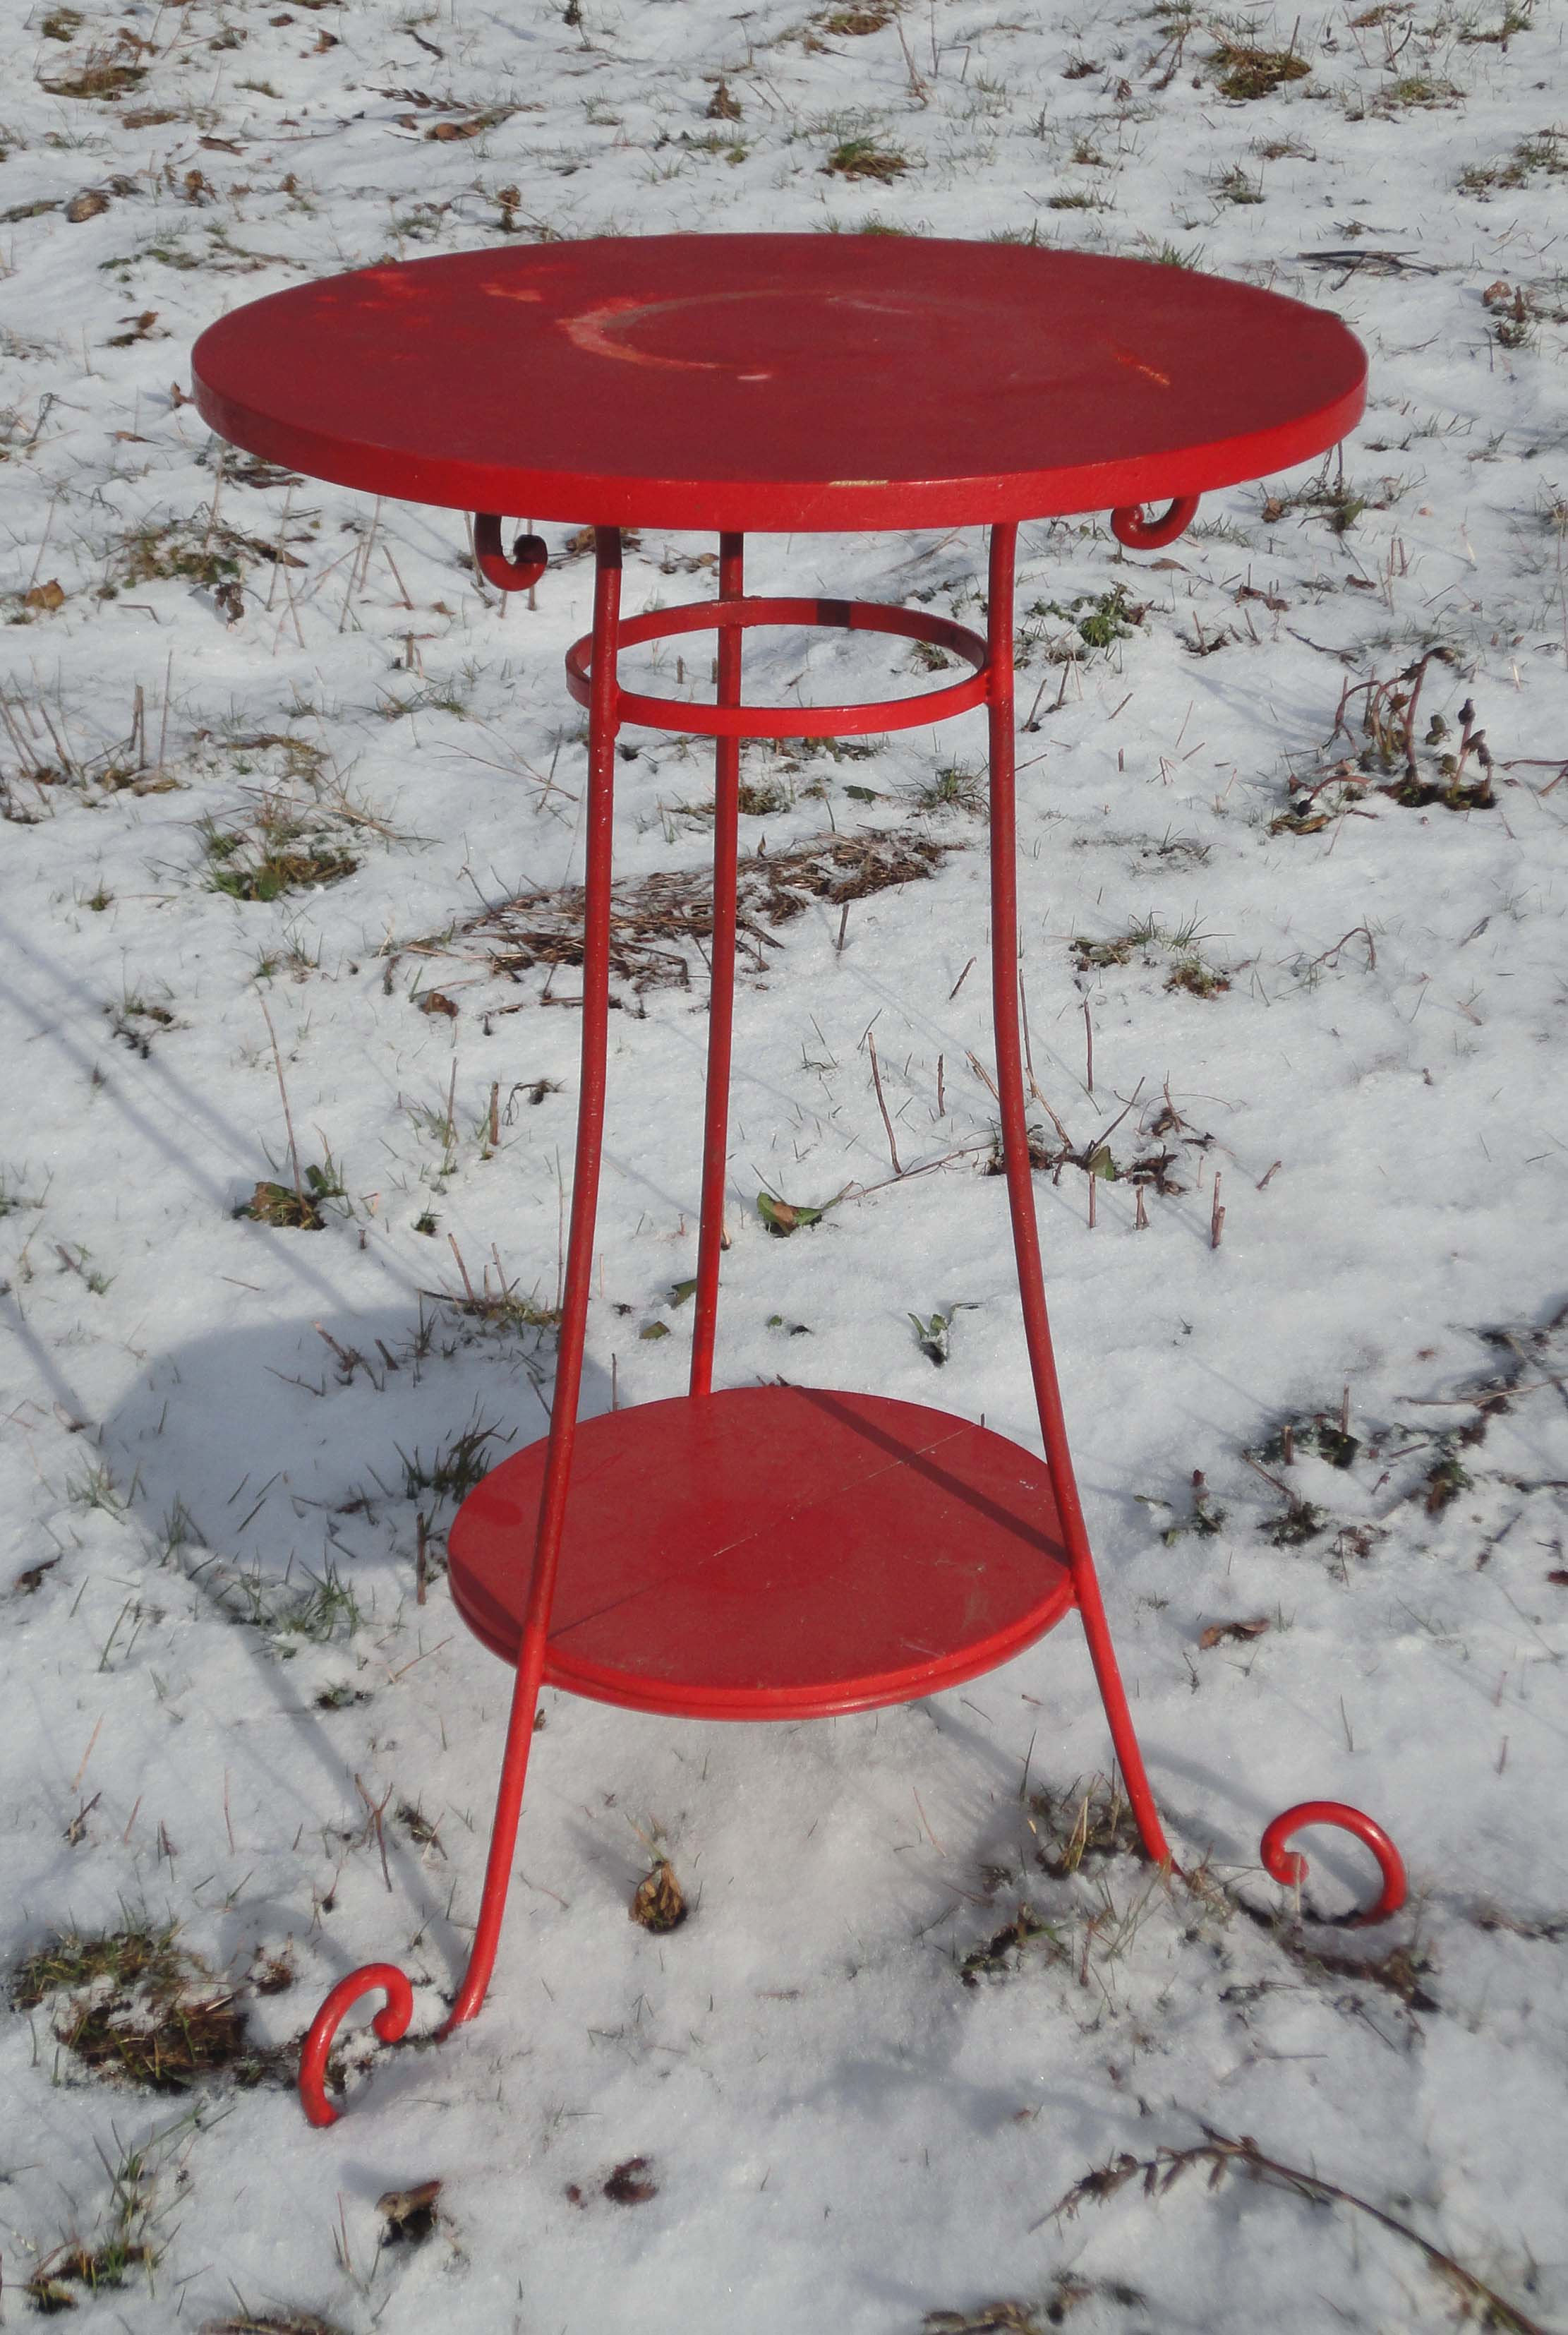 Mobilier de jardin ancien et objets en fer brocante d co jardin for Petite table de jardin metallique